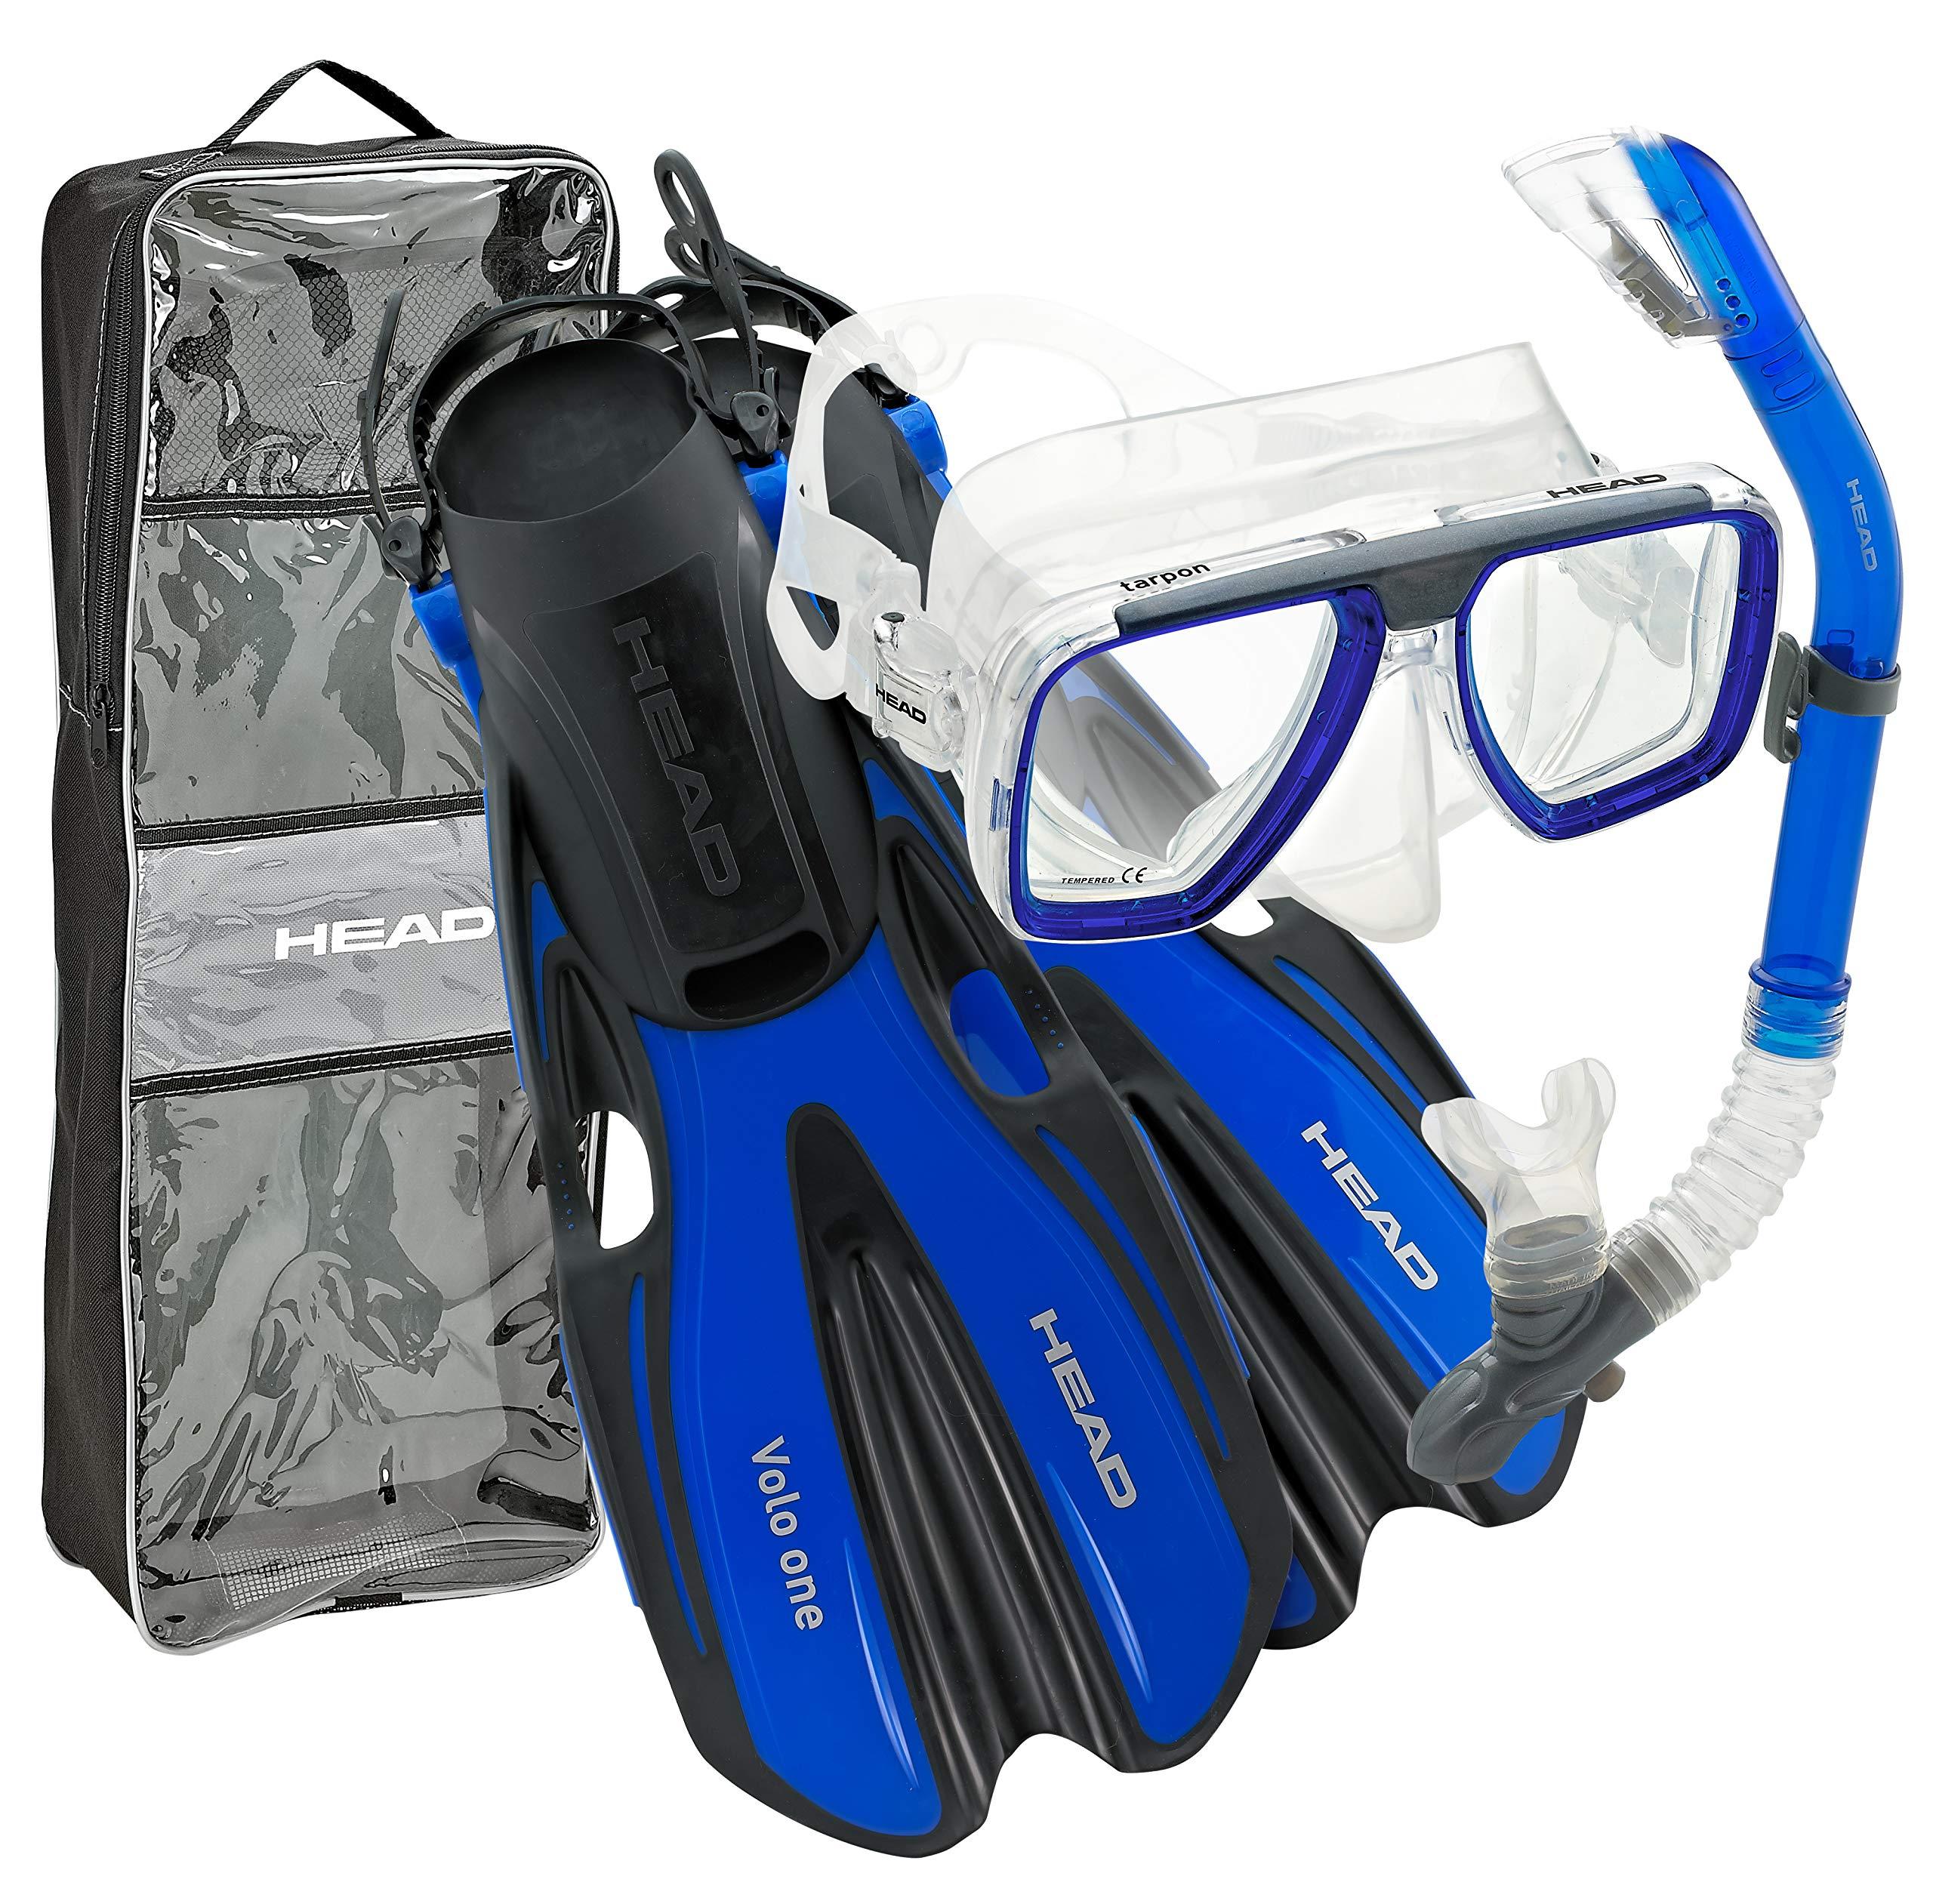 HEAD By Mares Tarpon Travel Friendly Premium Mask Fin Snorkel Set, Blue, Small, (4-6)